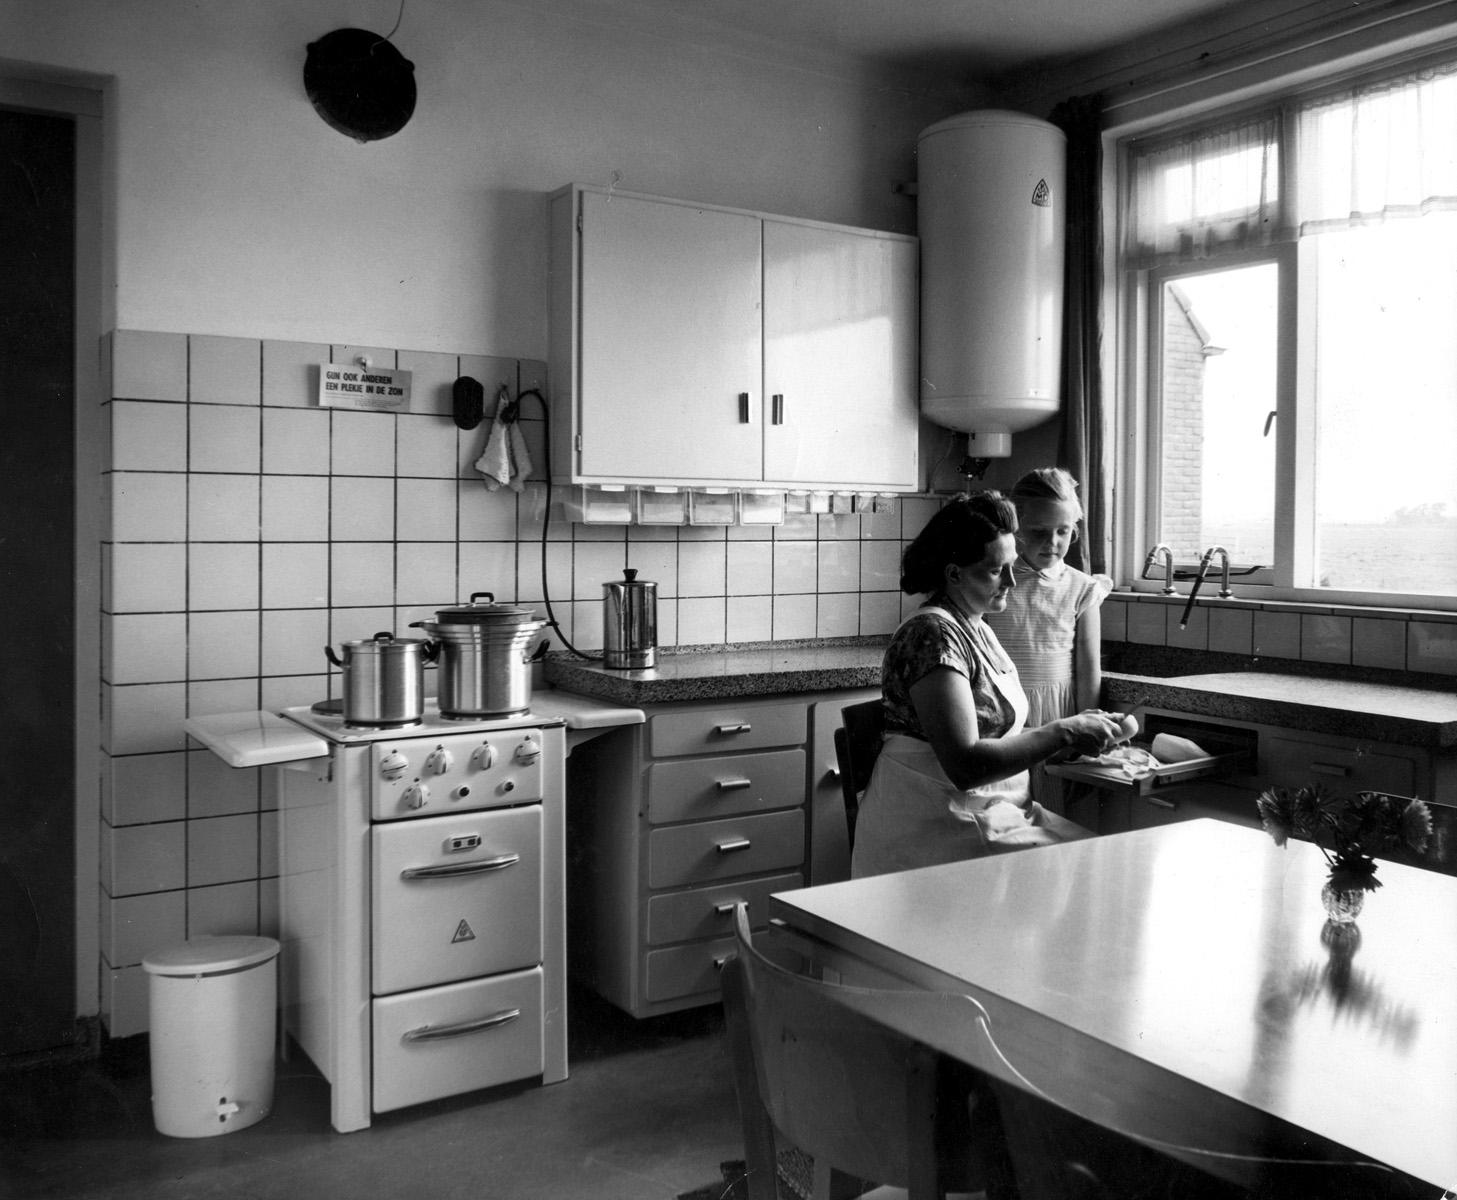 Bruynzeel Keukenkast : ... Bruynzeel] keukenkasten met granieten ...